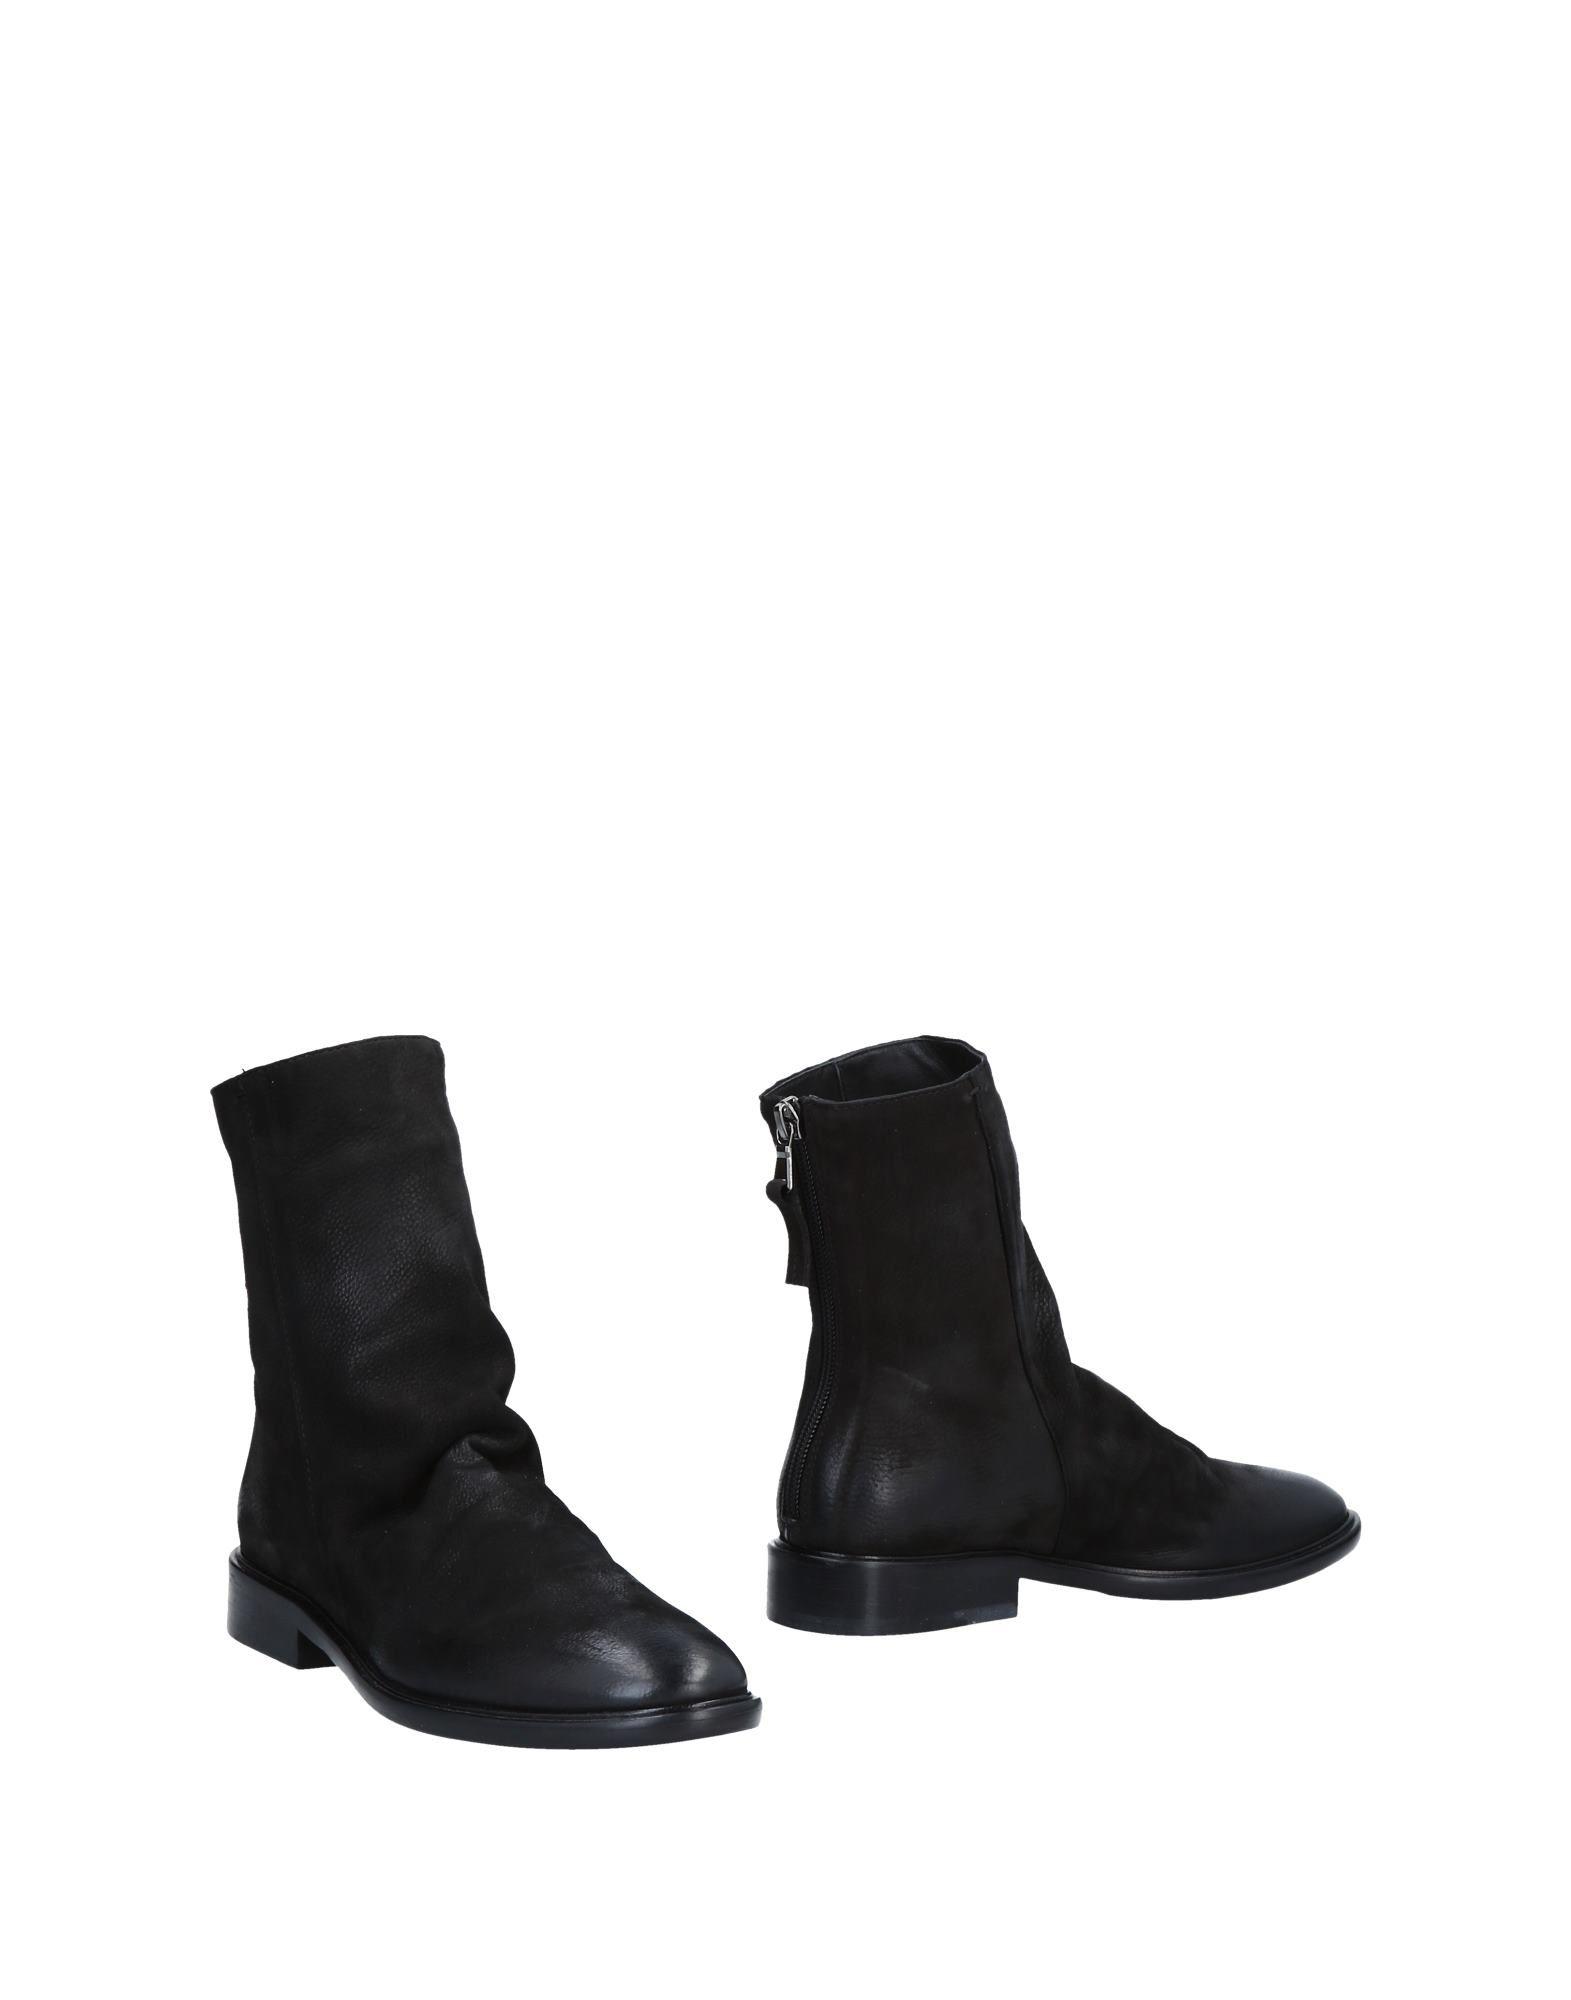 Stilvolle billige Schuhe Bruschi Stiefelette 11486067SH Damen  11486067SH Stiefelette e172d0